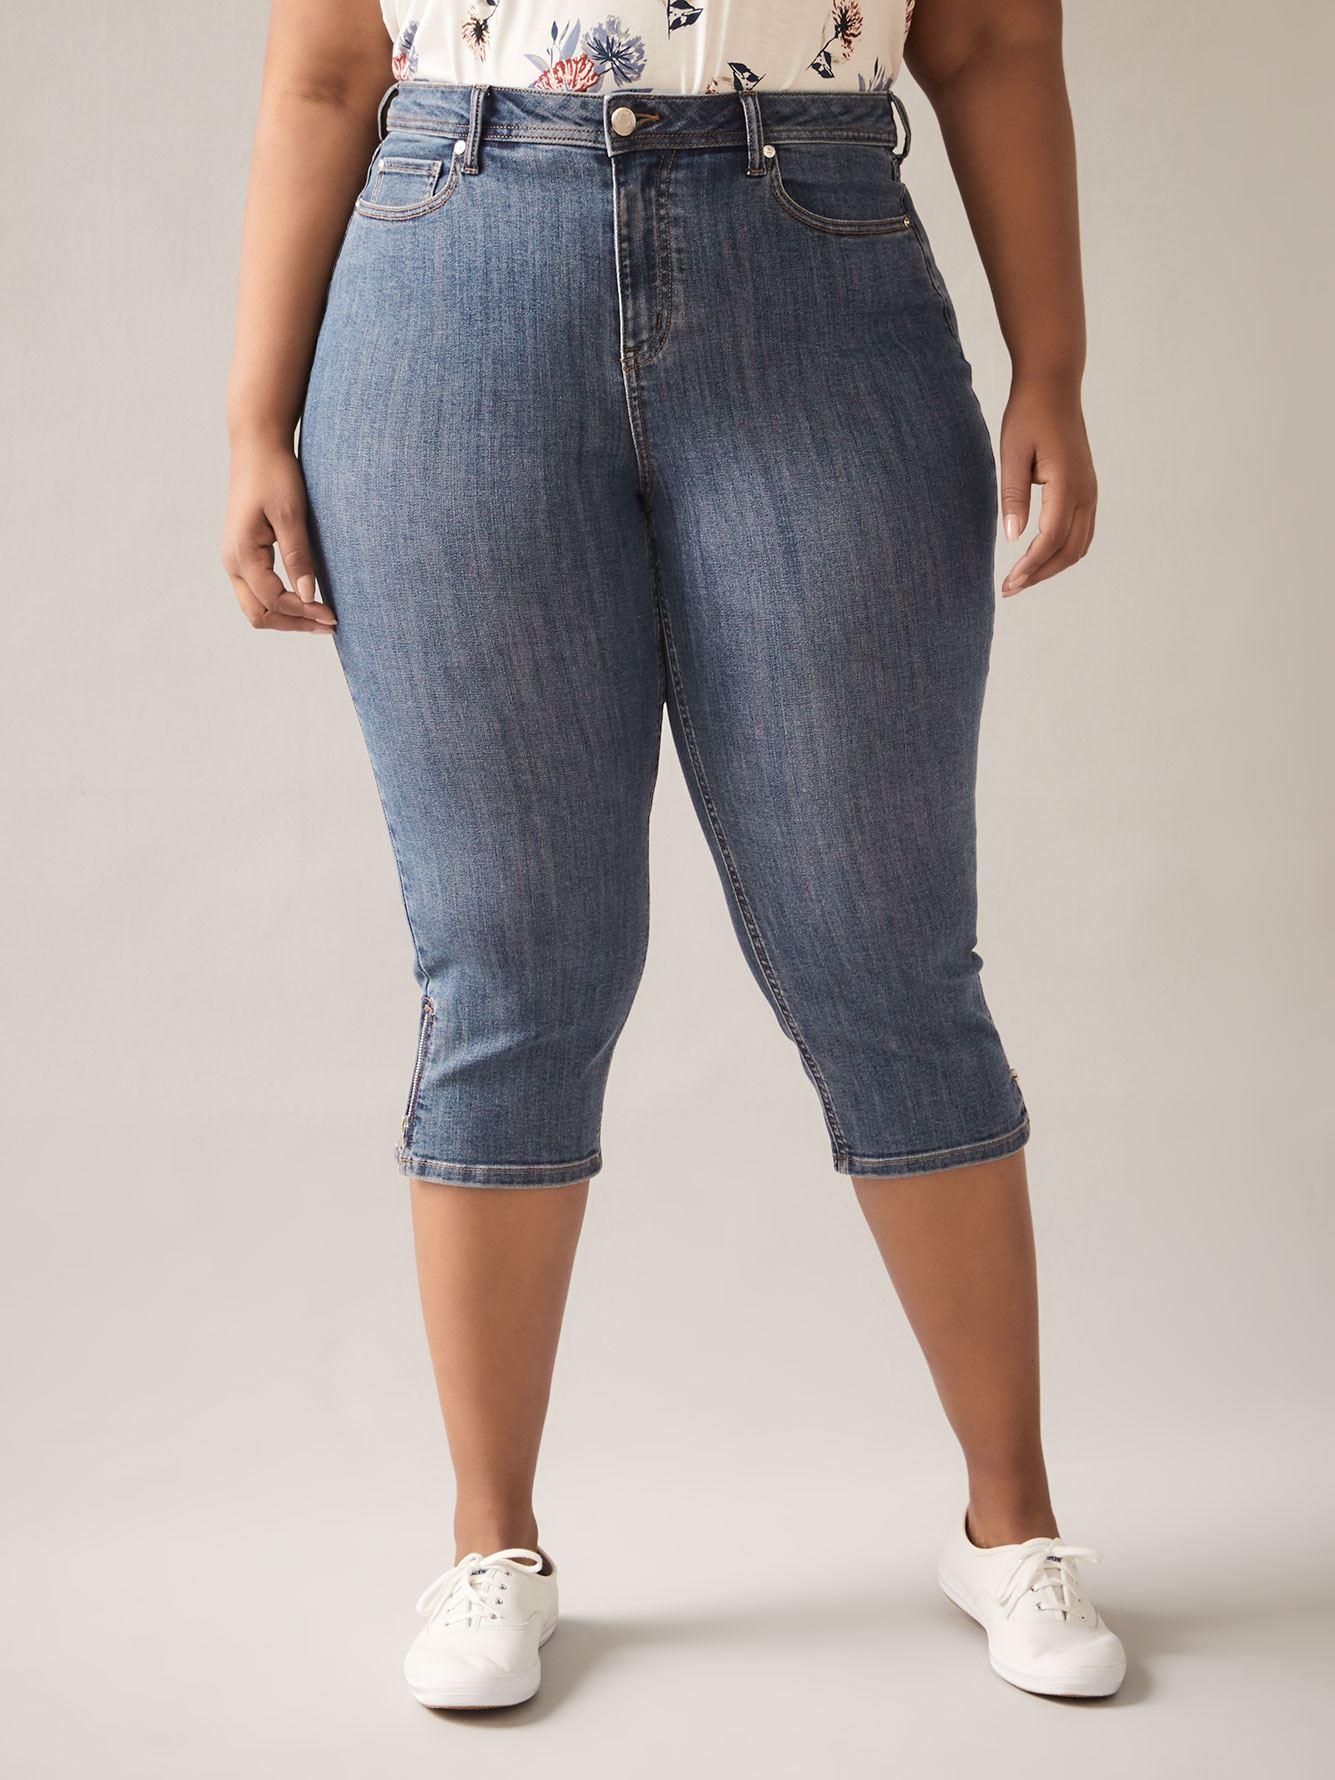 Curvy Fit, Straight-Leg Blue Denim Capri - In Every Story